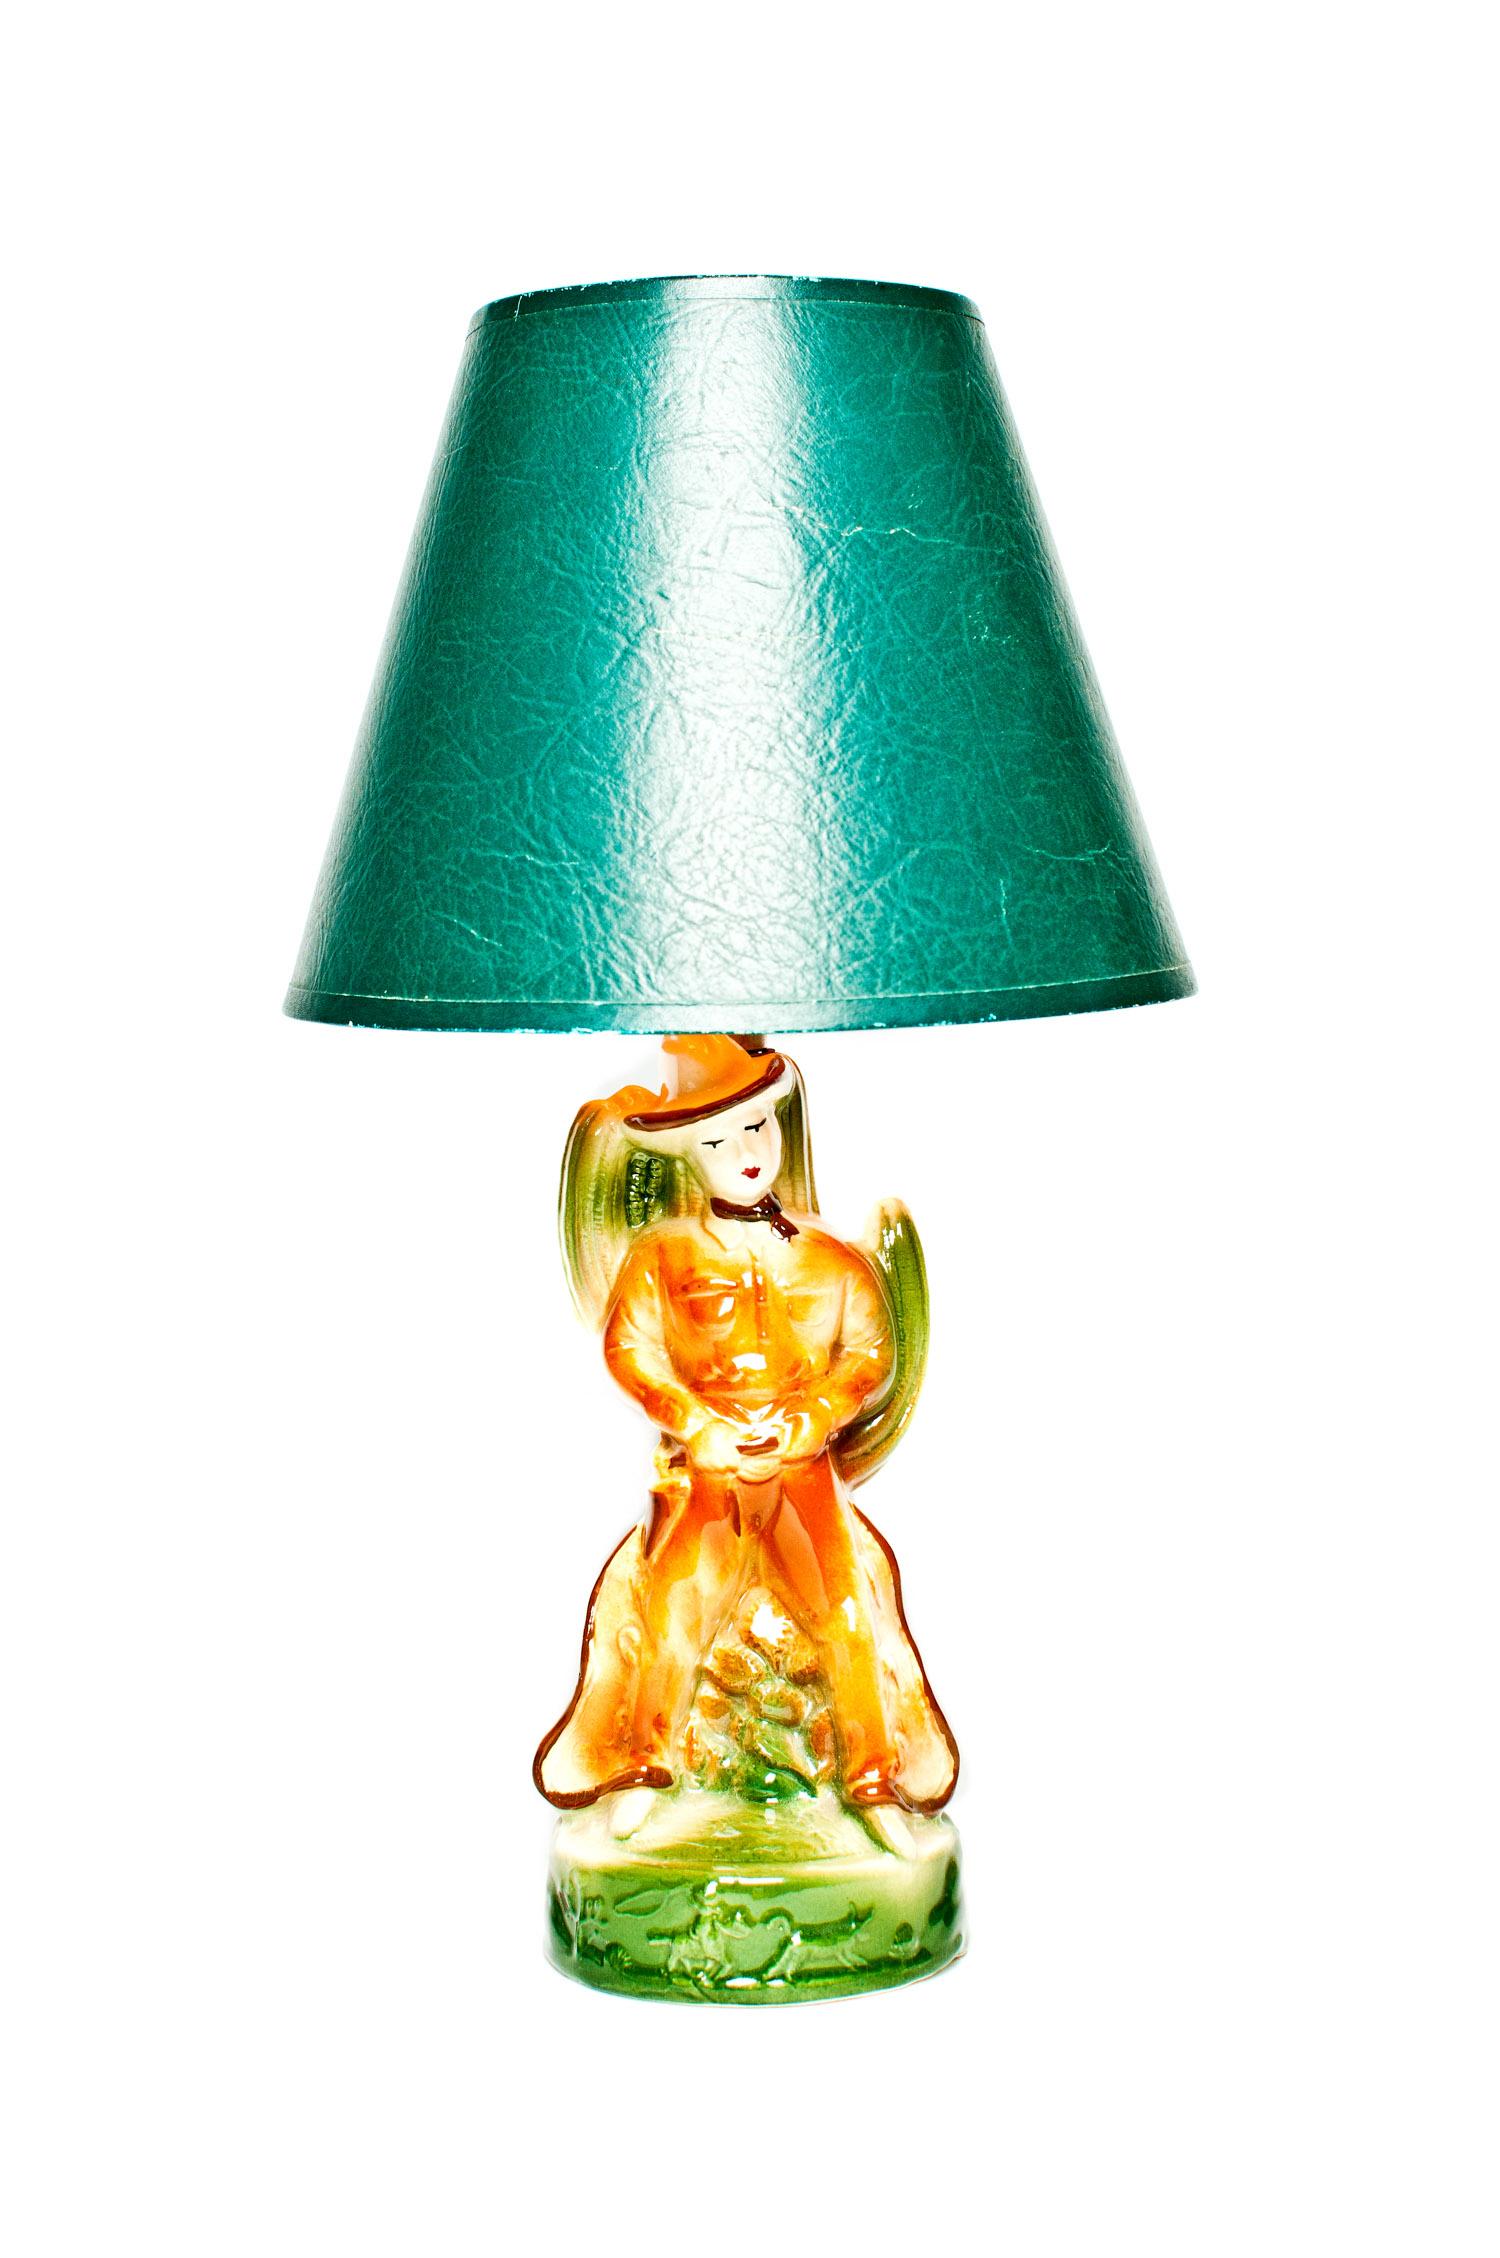 1950's Cowboy Lamp